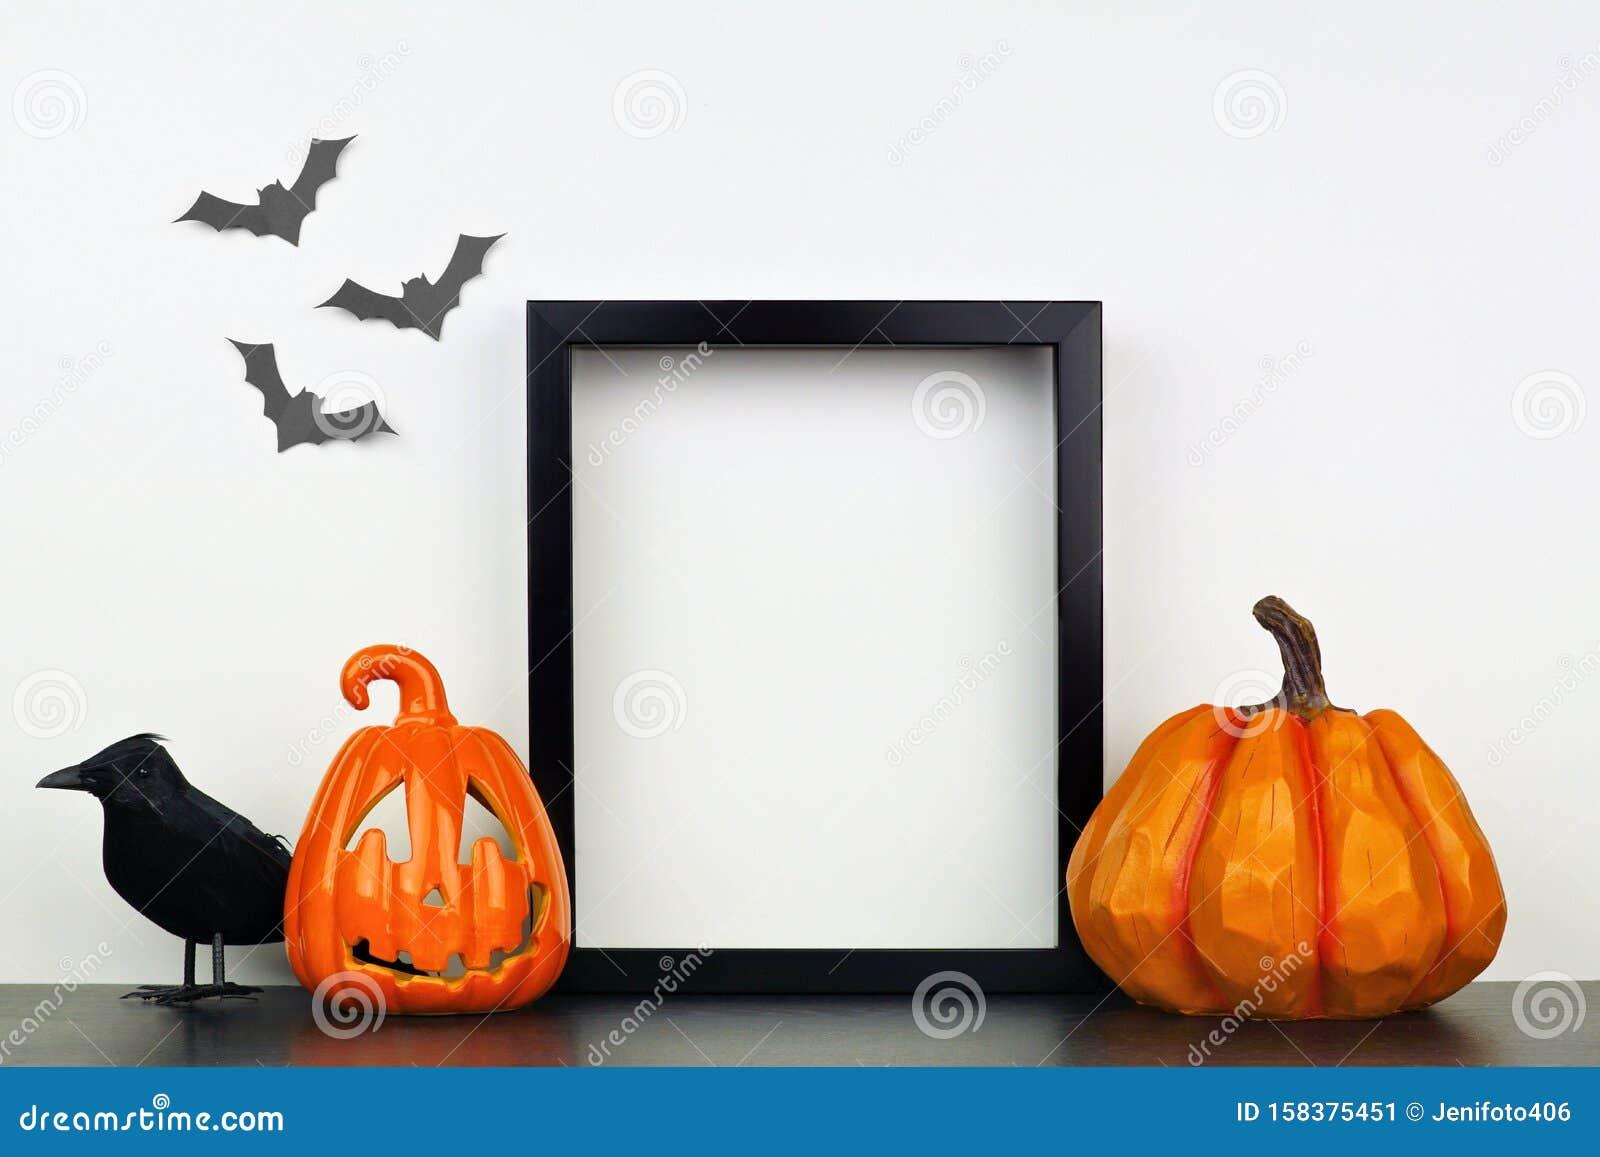 Mock up black frame with Halloween Jack o Lantern, pumpkin and crow decor on a shelf against a white wall